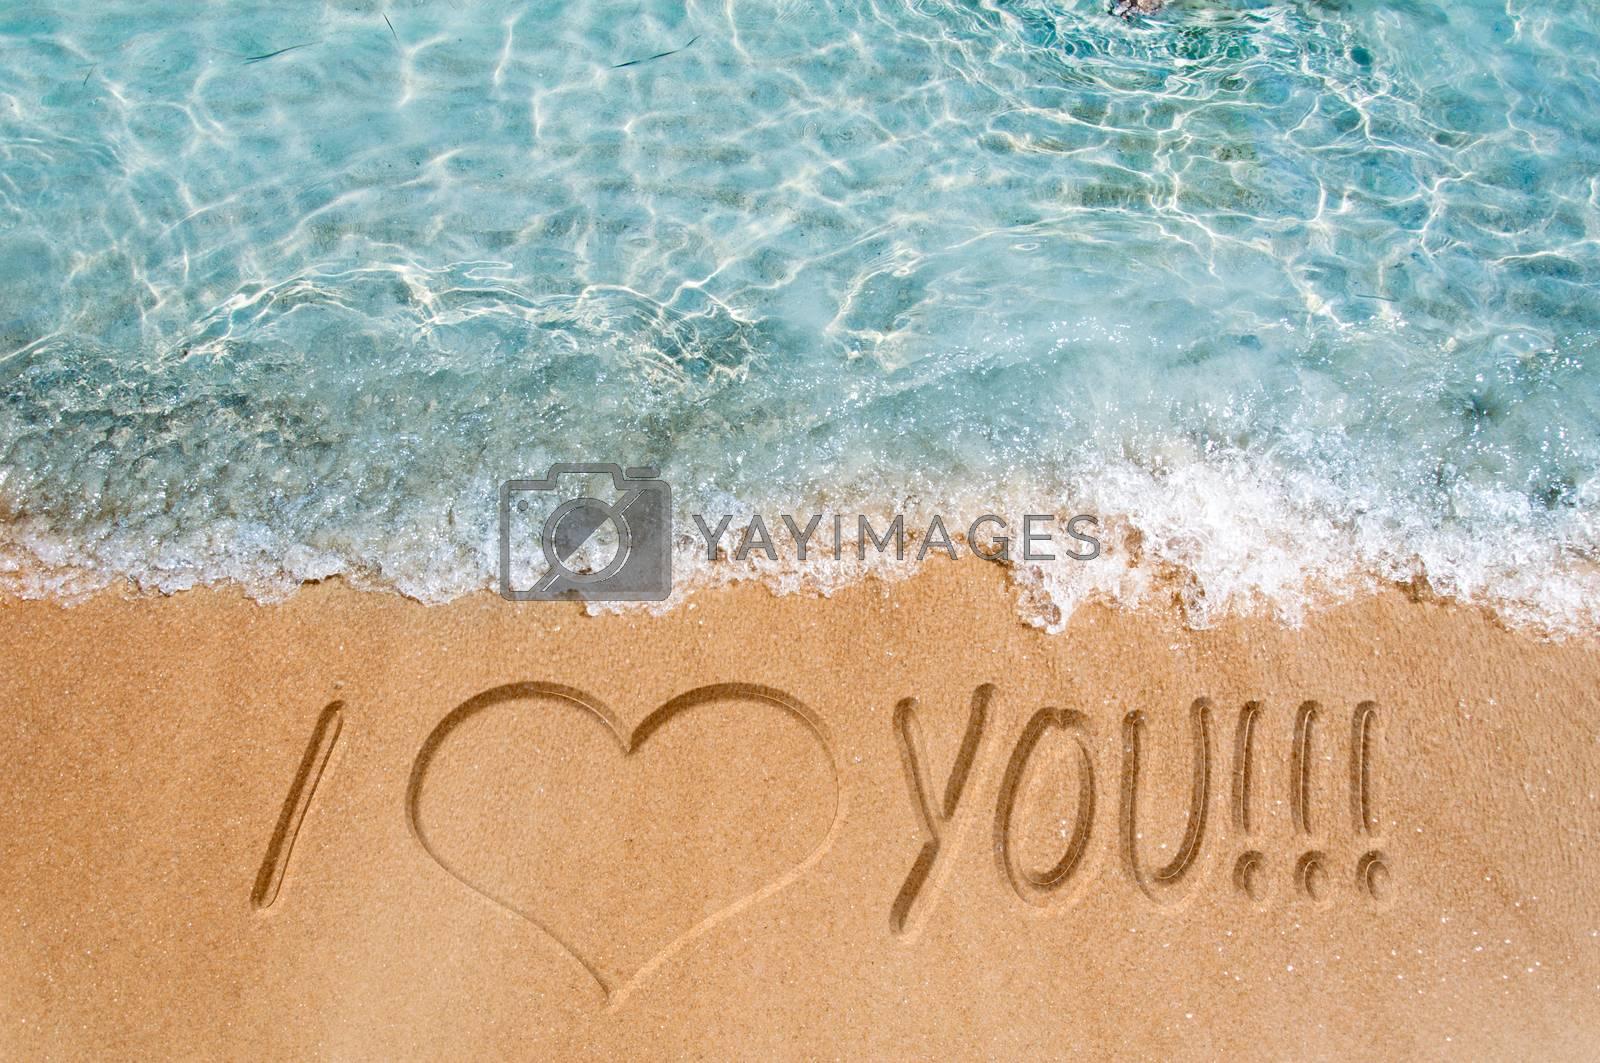 I love you word sign on the beach sand